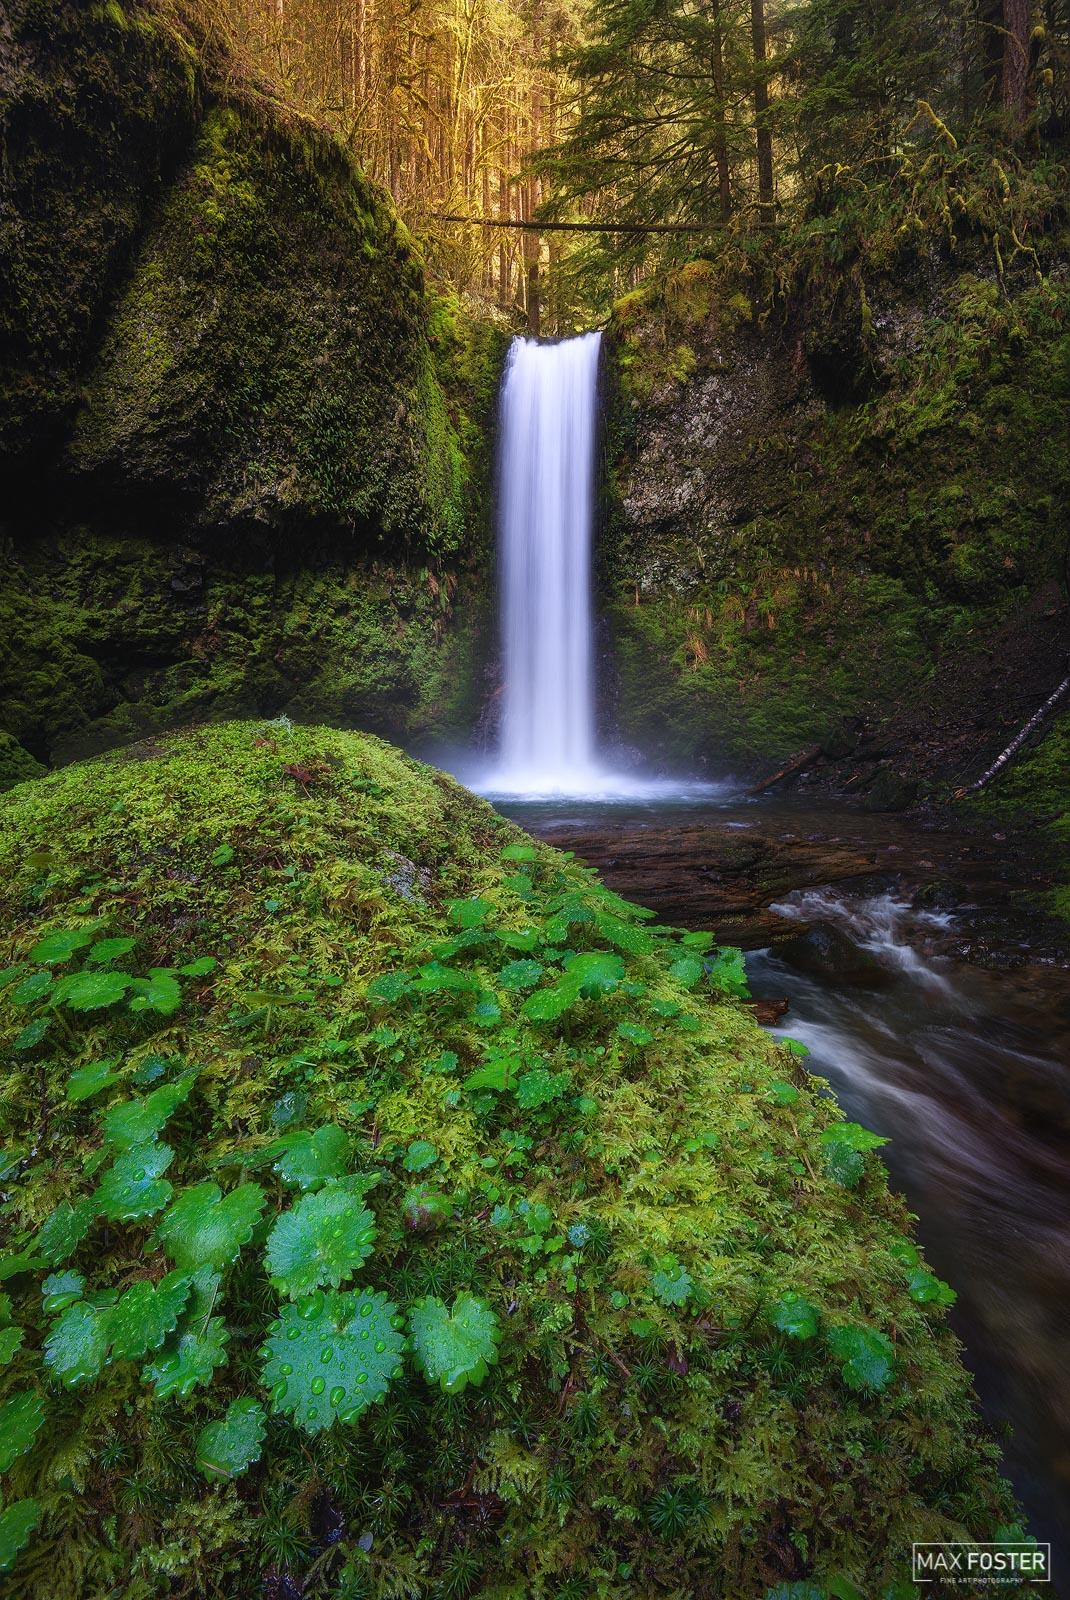 Wiesendanger Falls, Oregon, Columbia River Gorge, Raindrops, Multnomah County, Double Falls, Twanklaskie Falls, photo